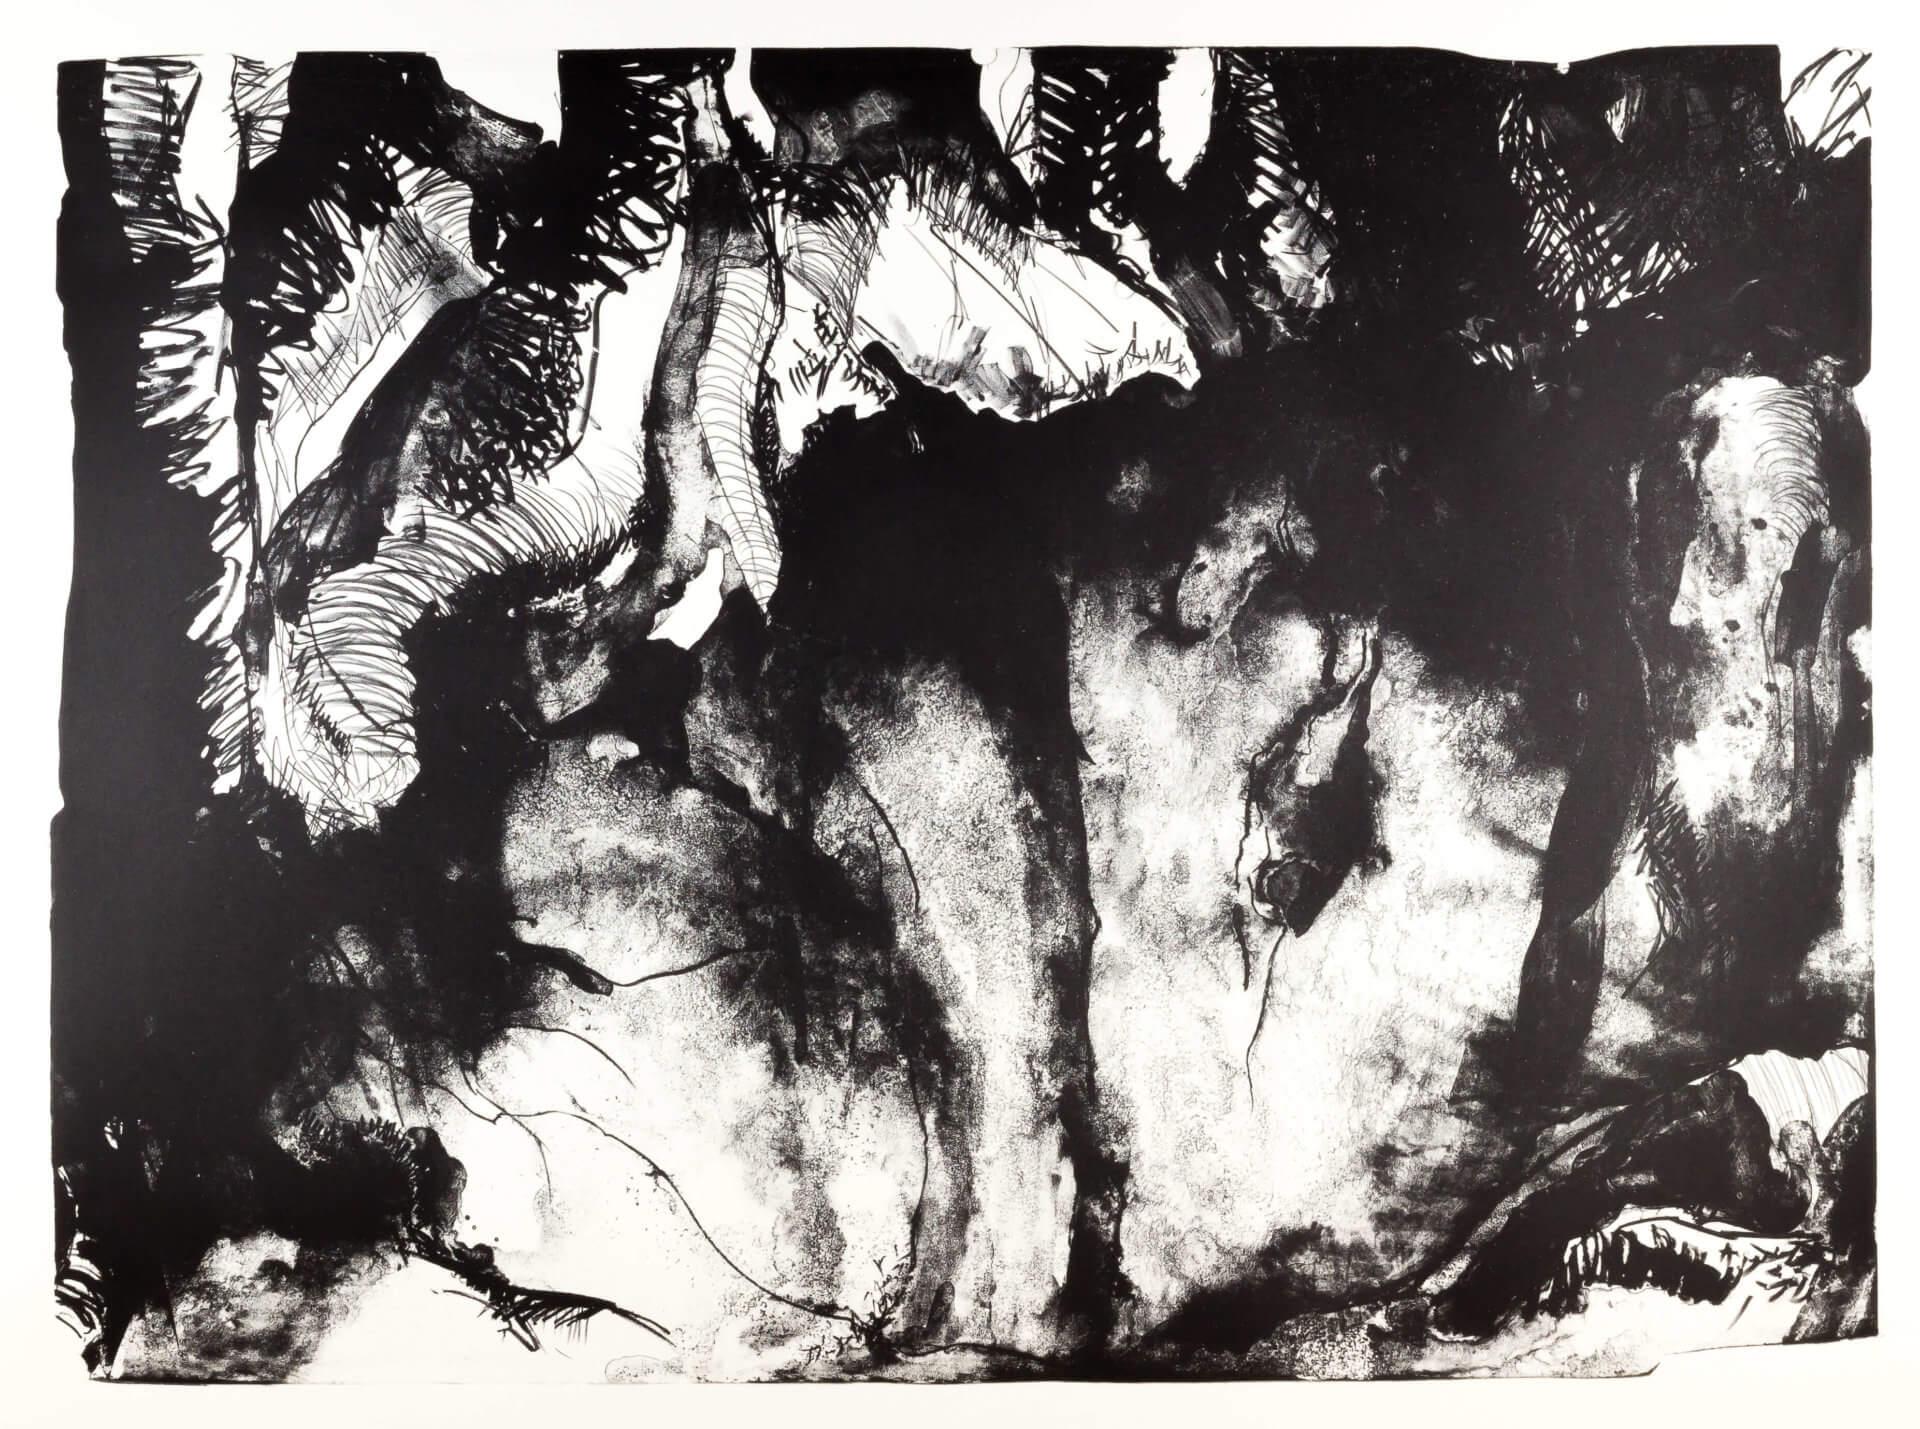 Katharina Albers, Wald (A), 2015, Lithographie (8 Steine), Unikat, 70×100 cm